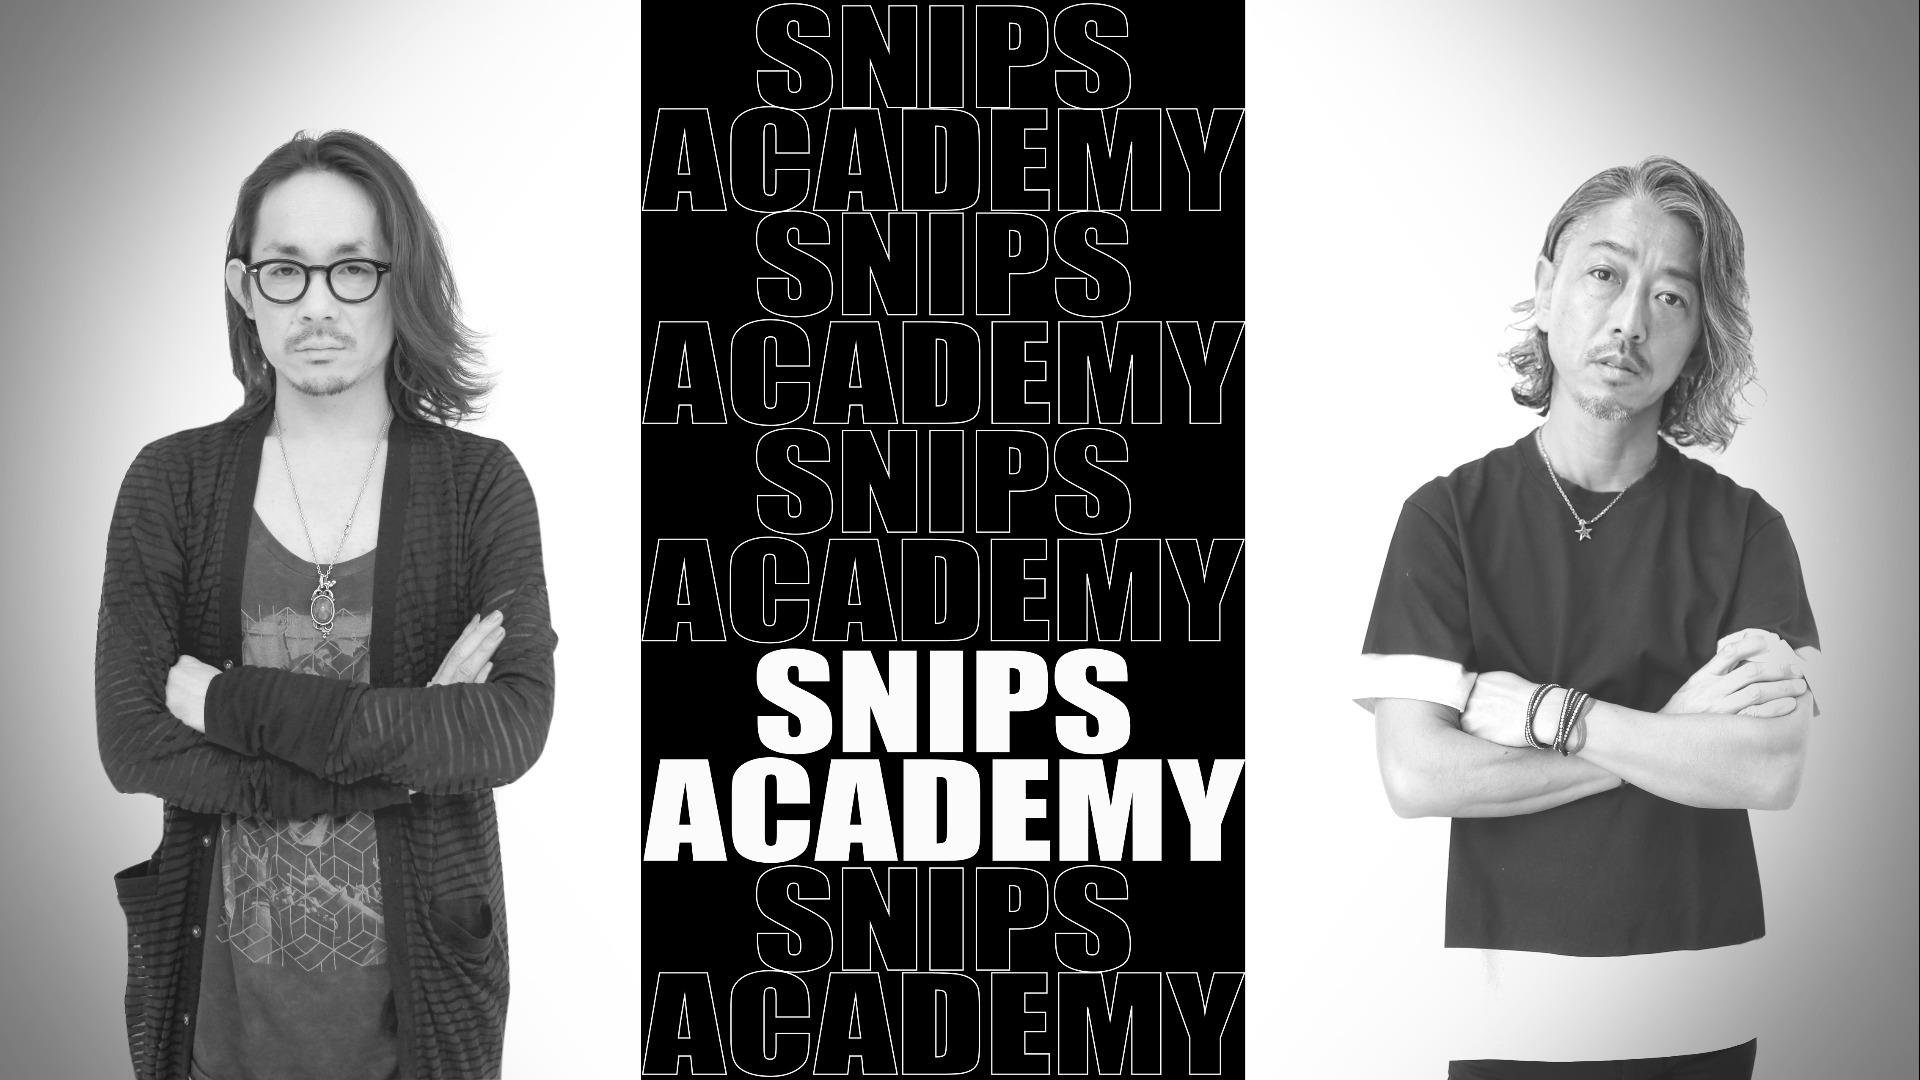 SNIPS Academy